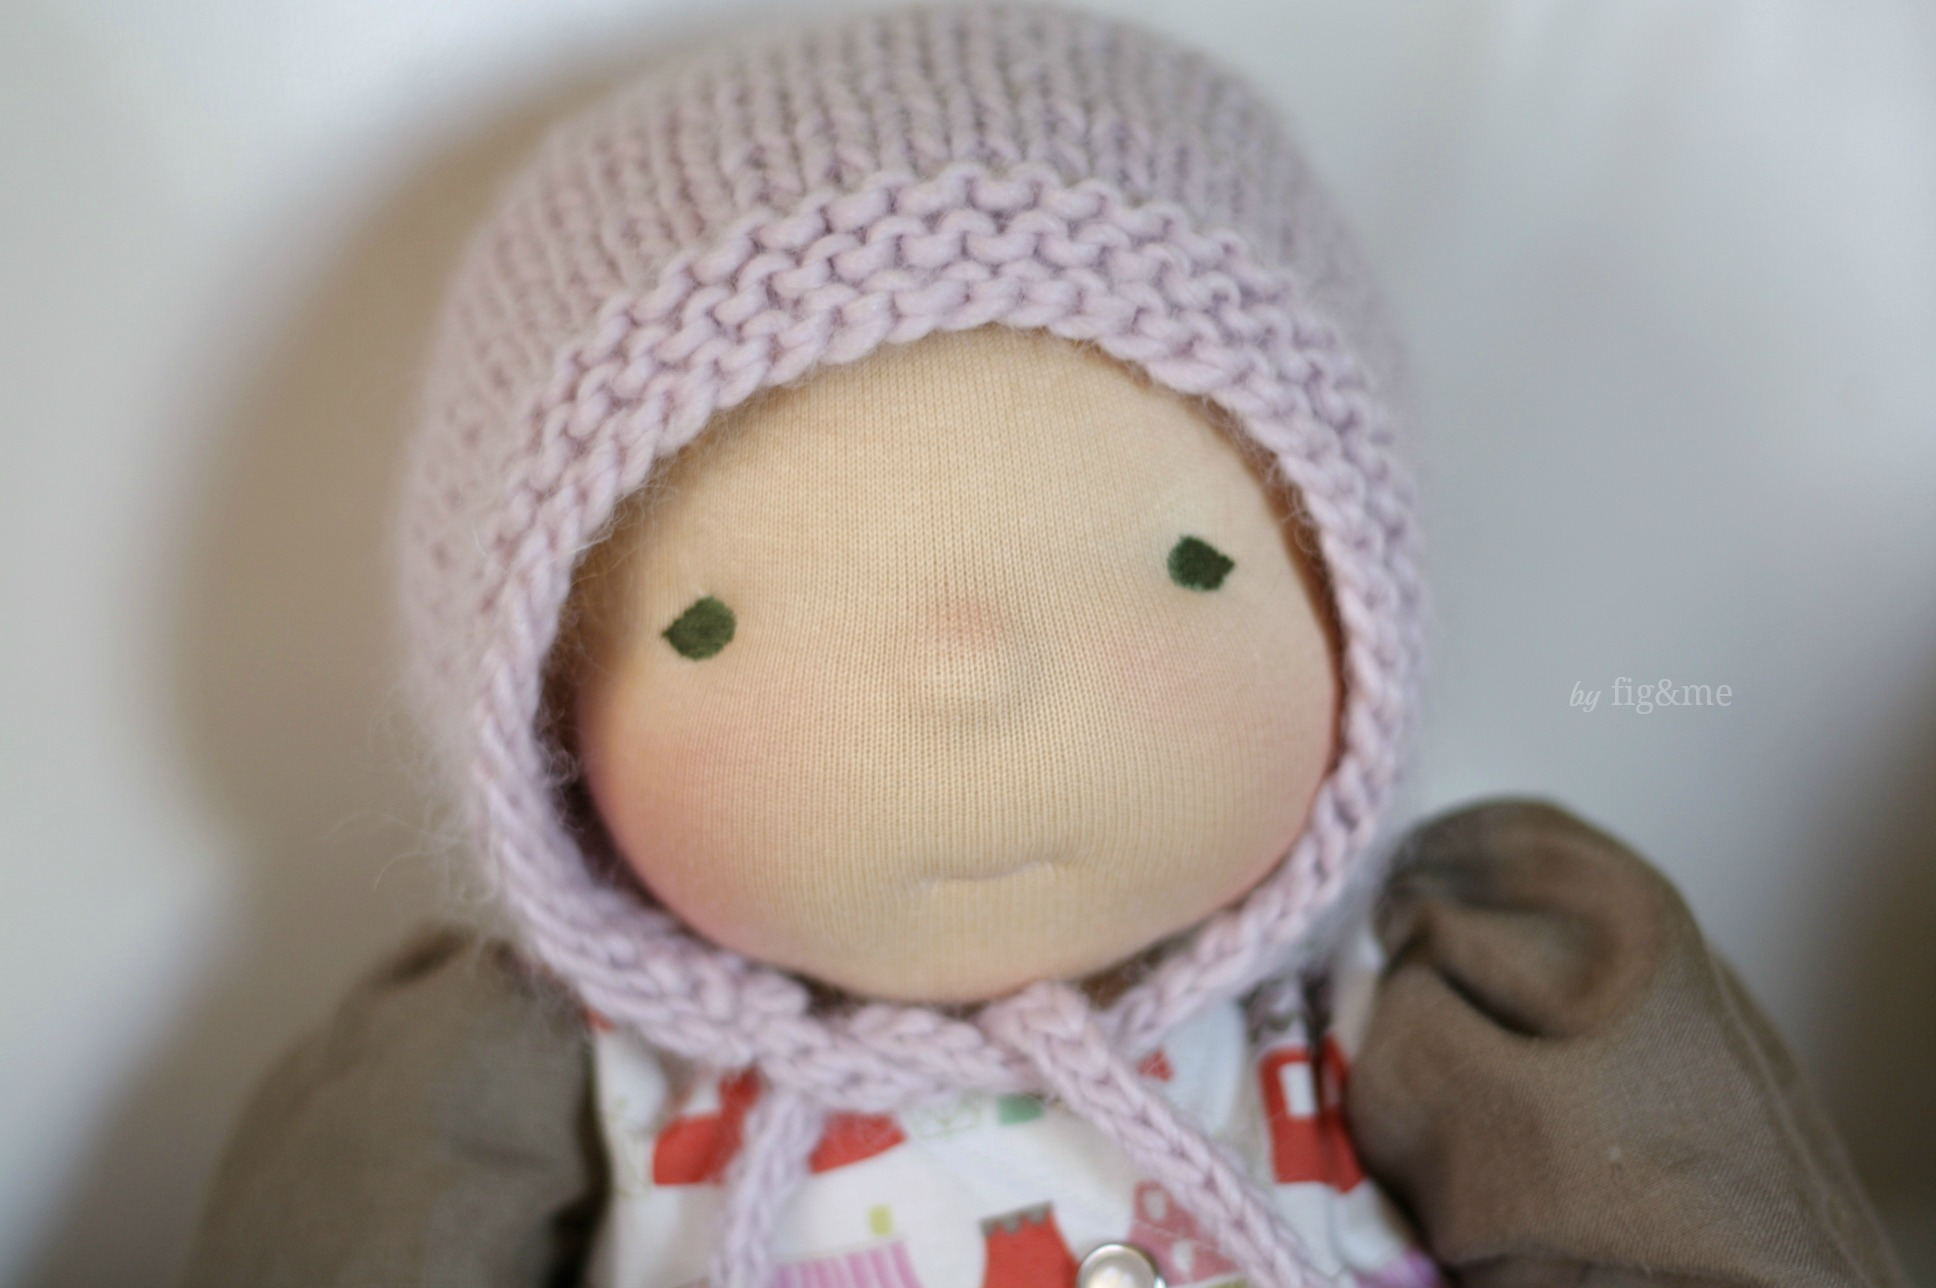 joni-with-pink-bonnet-figandme.jpg